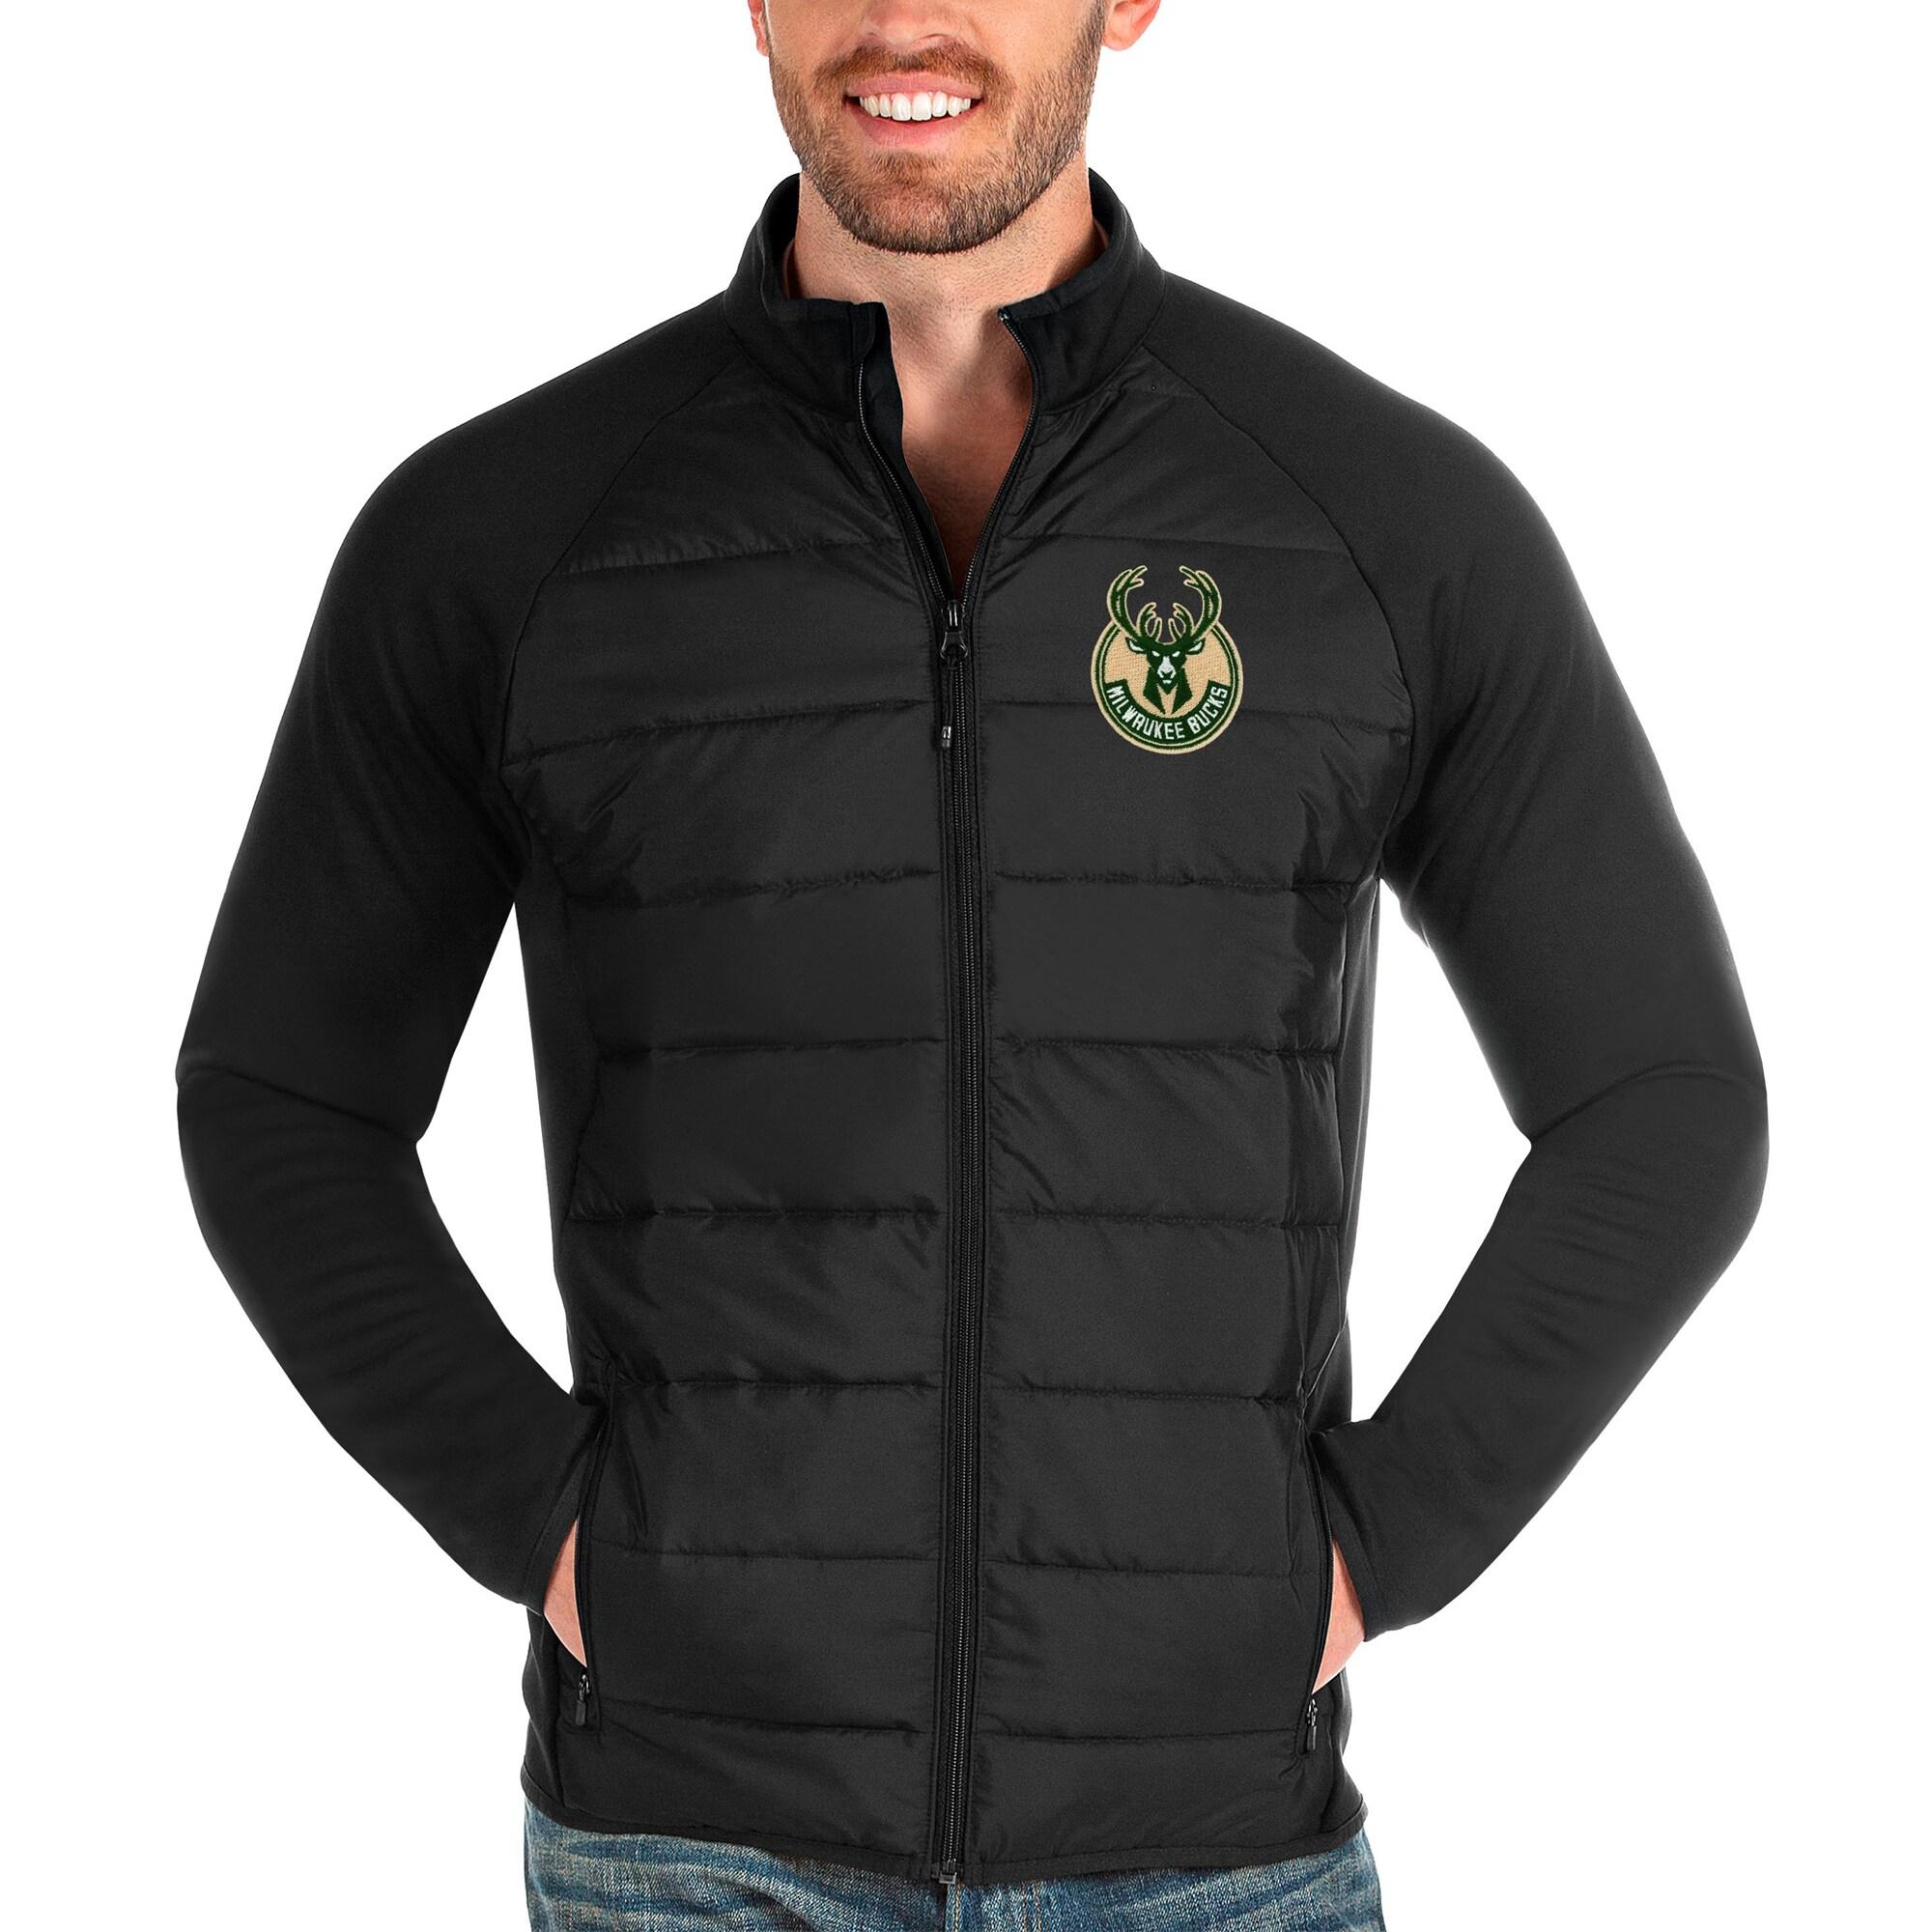 Milwaukee Bucks Antigua Altitude Full-Zip Jacket - Black